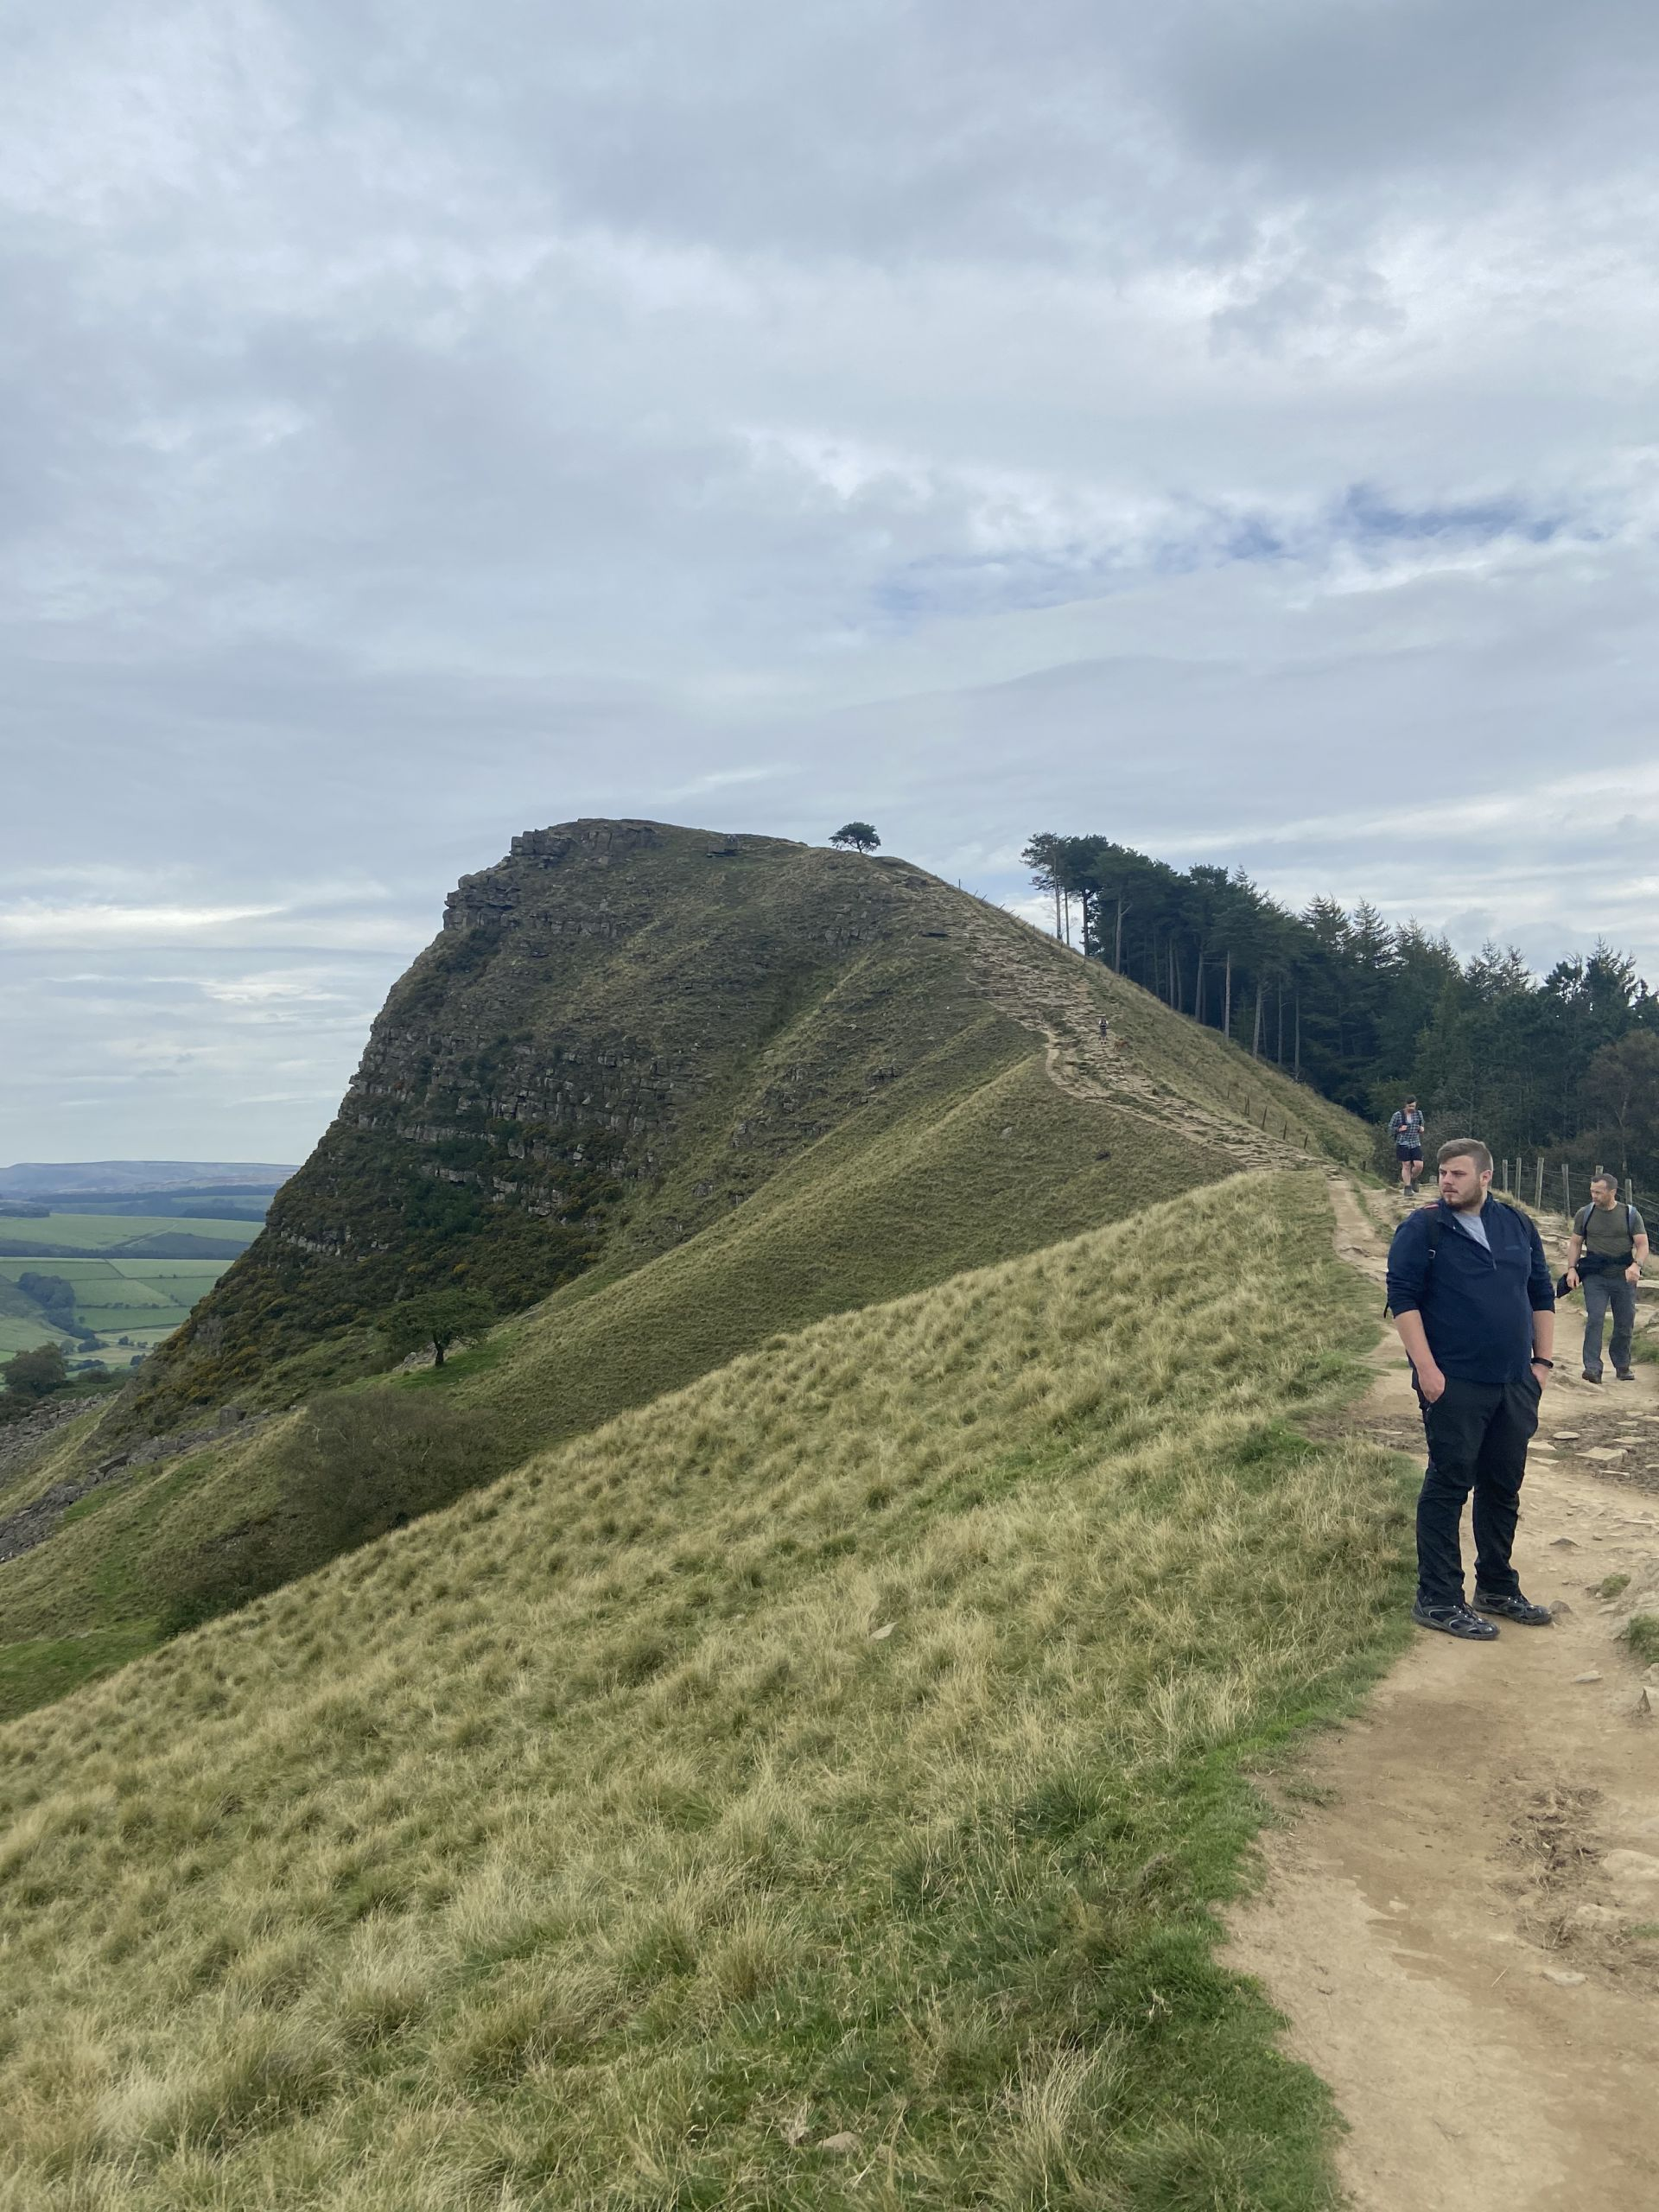 Mam Tor ridge walk in the Peak District